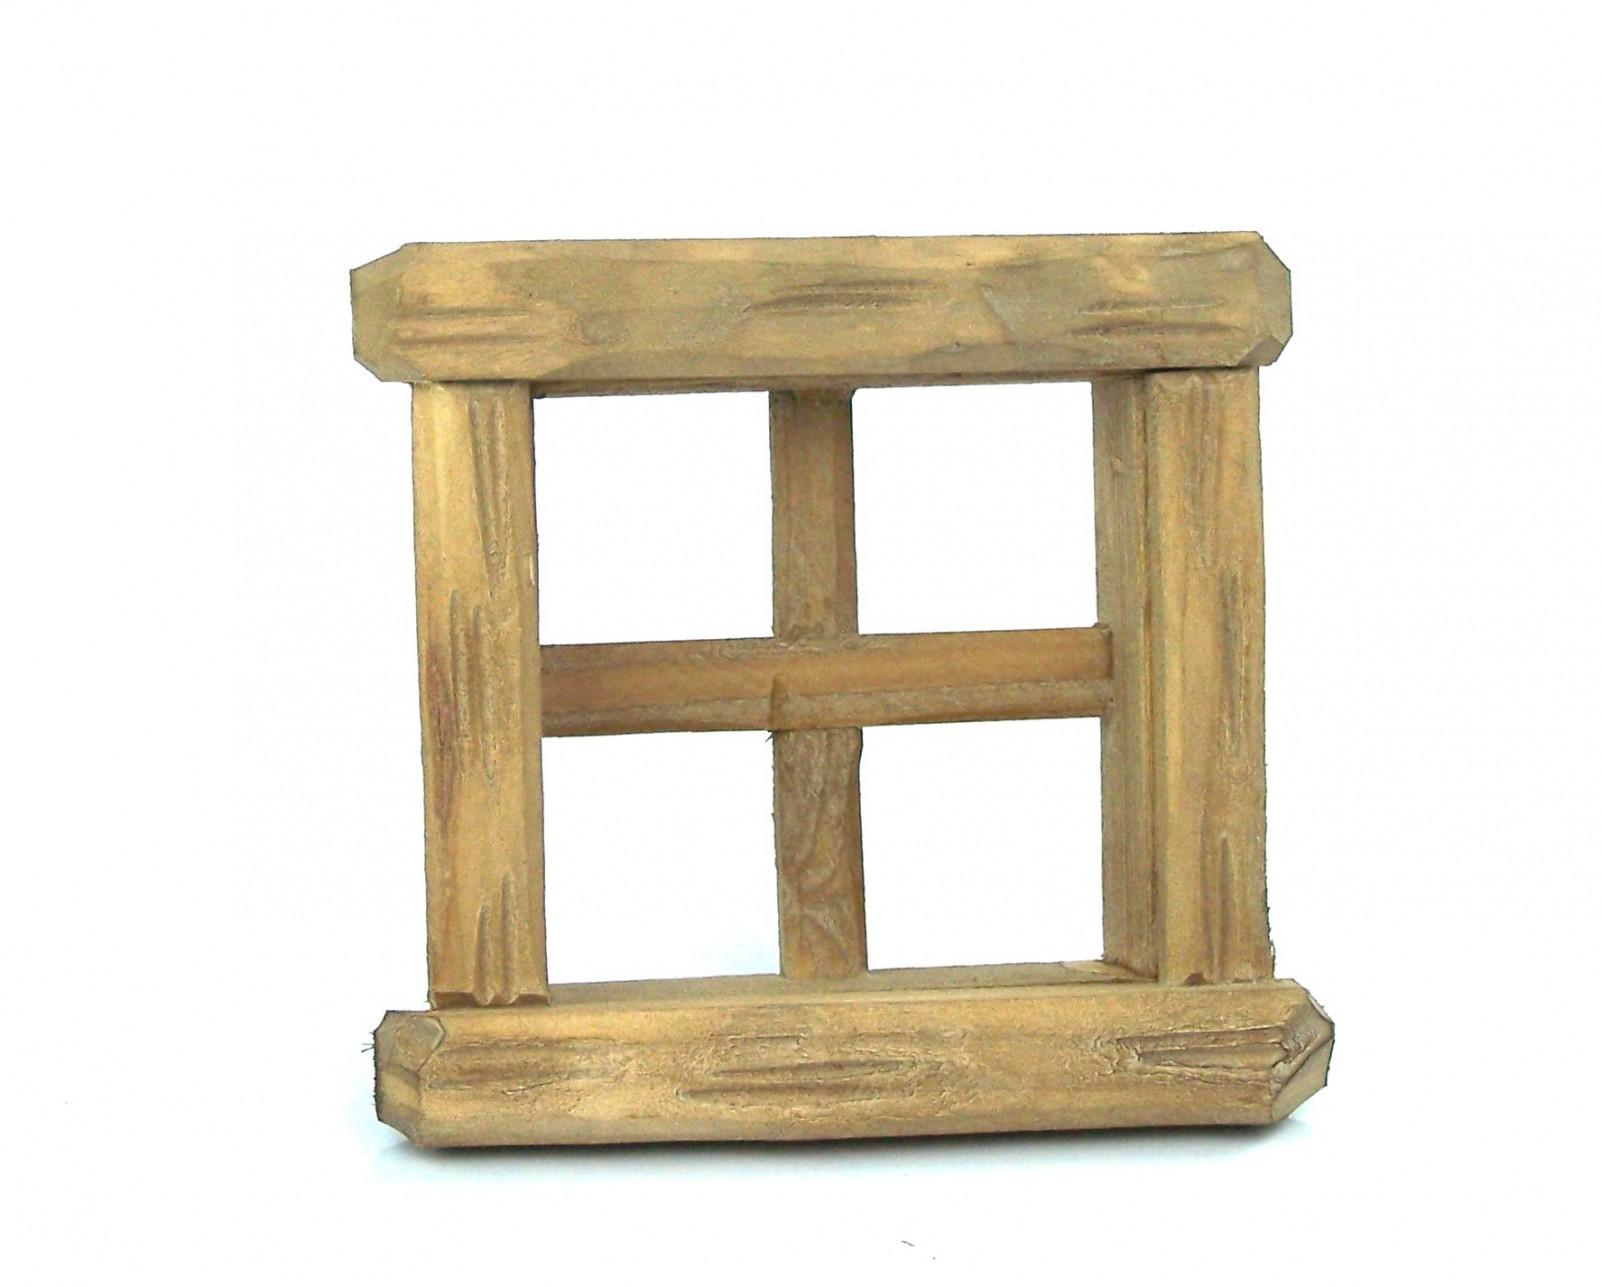 Fenster aus holz f r 6 5x6 5 cm fensterausschnitt for Fenster holz